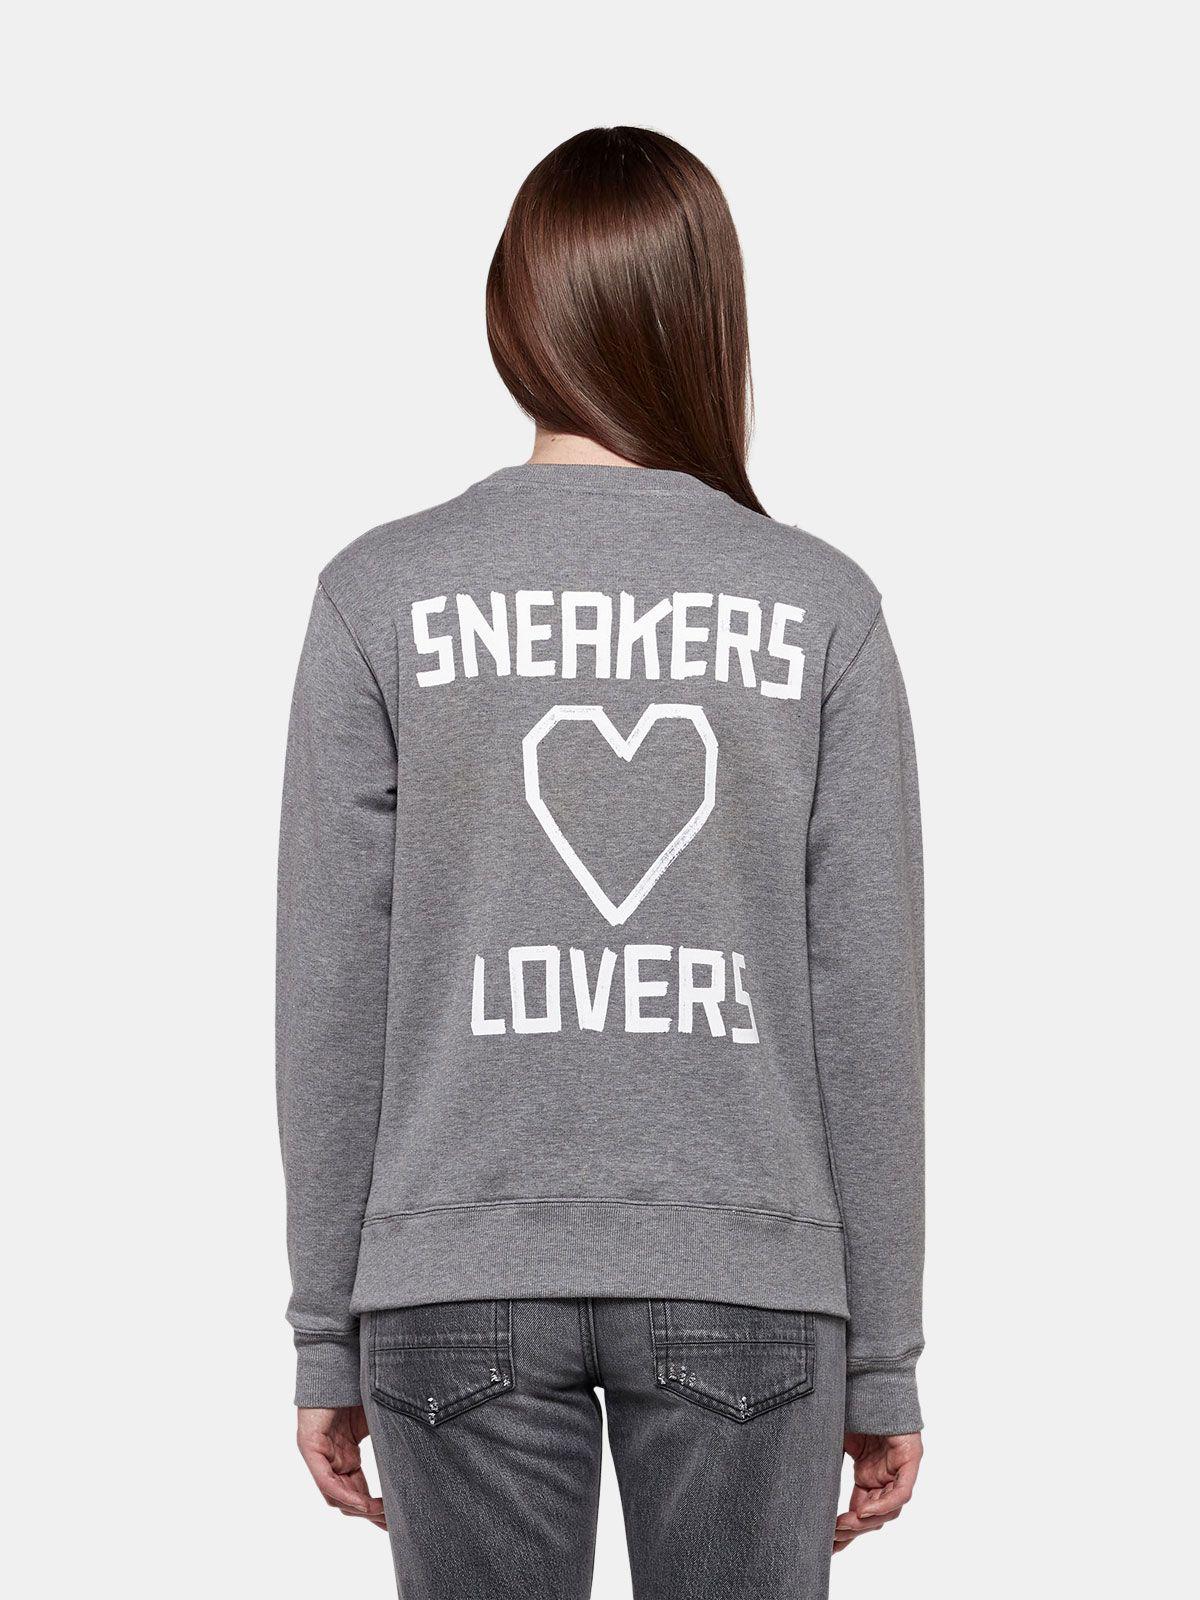 Golden Goose - Grey Higanbana sweatshirt with Sneakers Lovers print on the back in